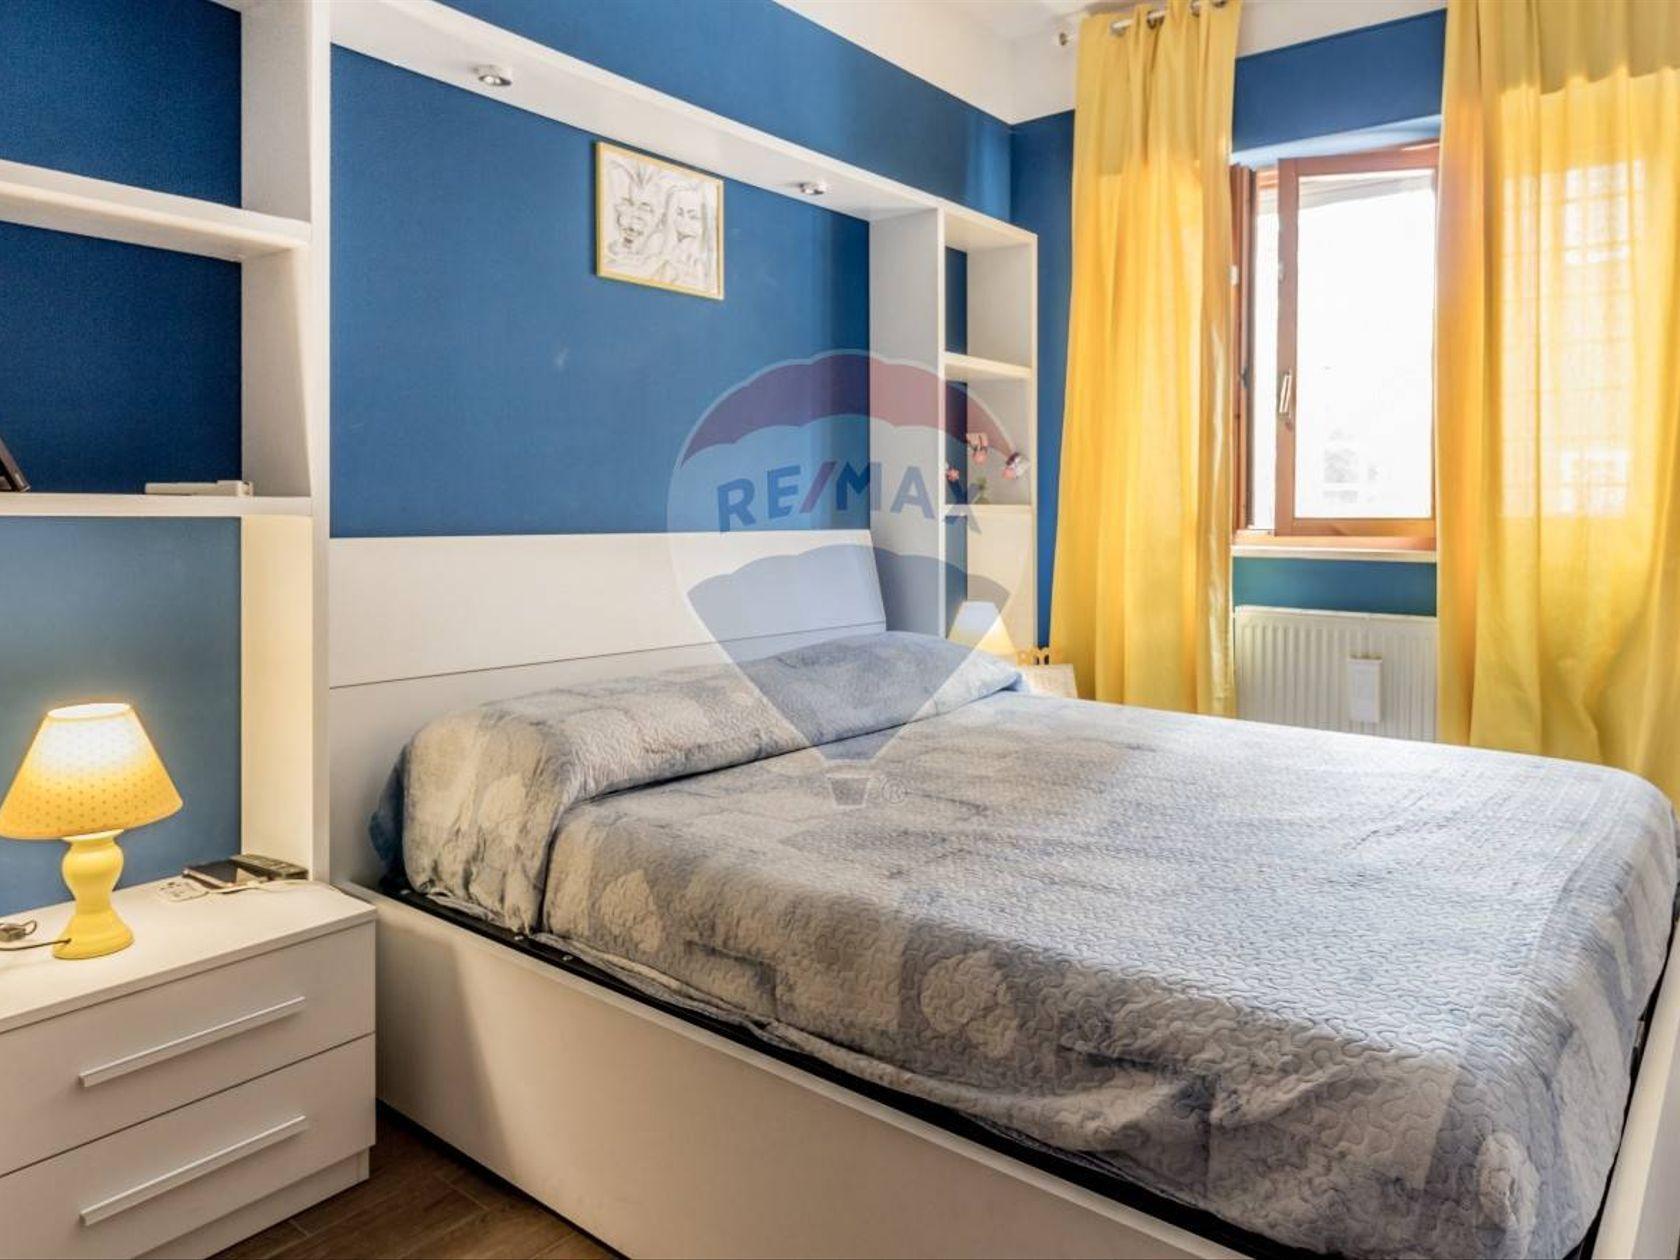 Appartamento Villa Adriana, Tivoli, RM Vendita - Foto 13